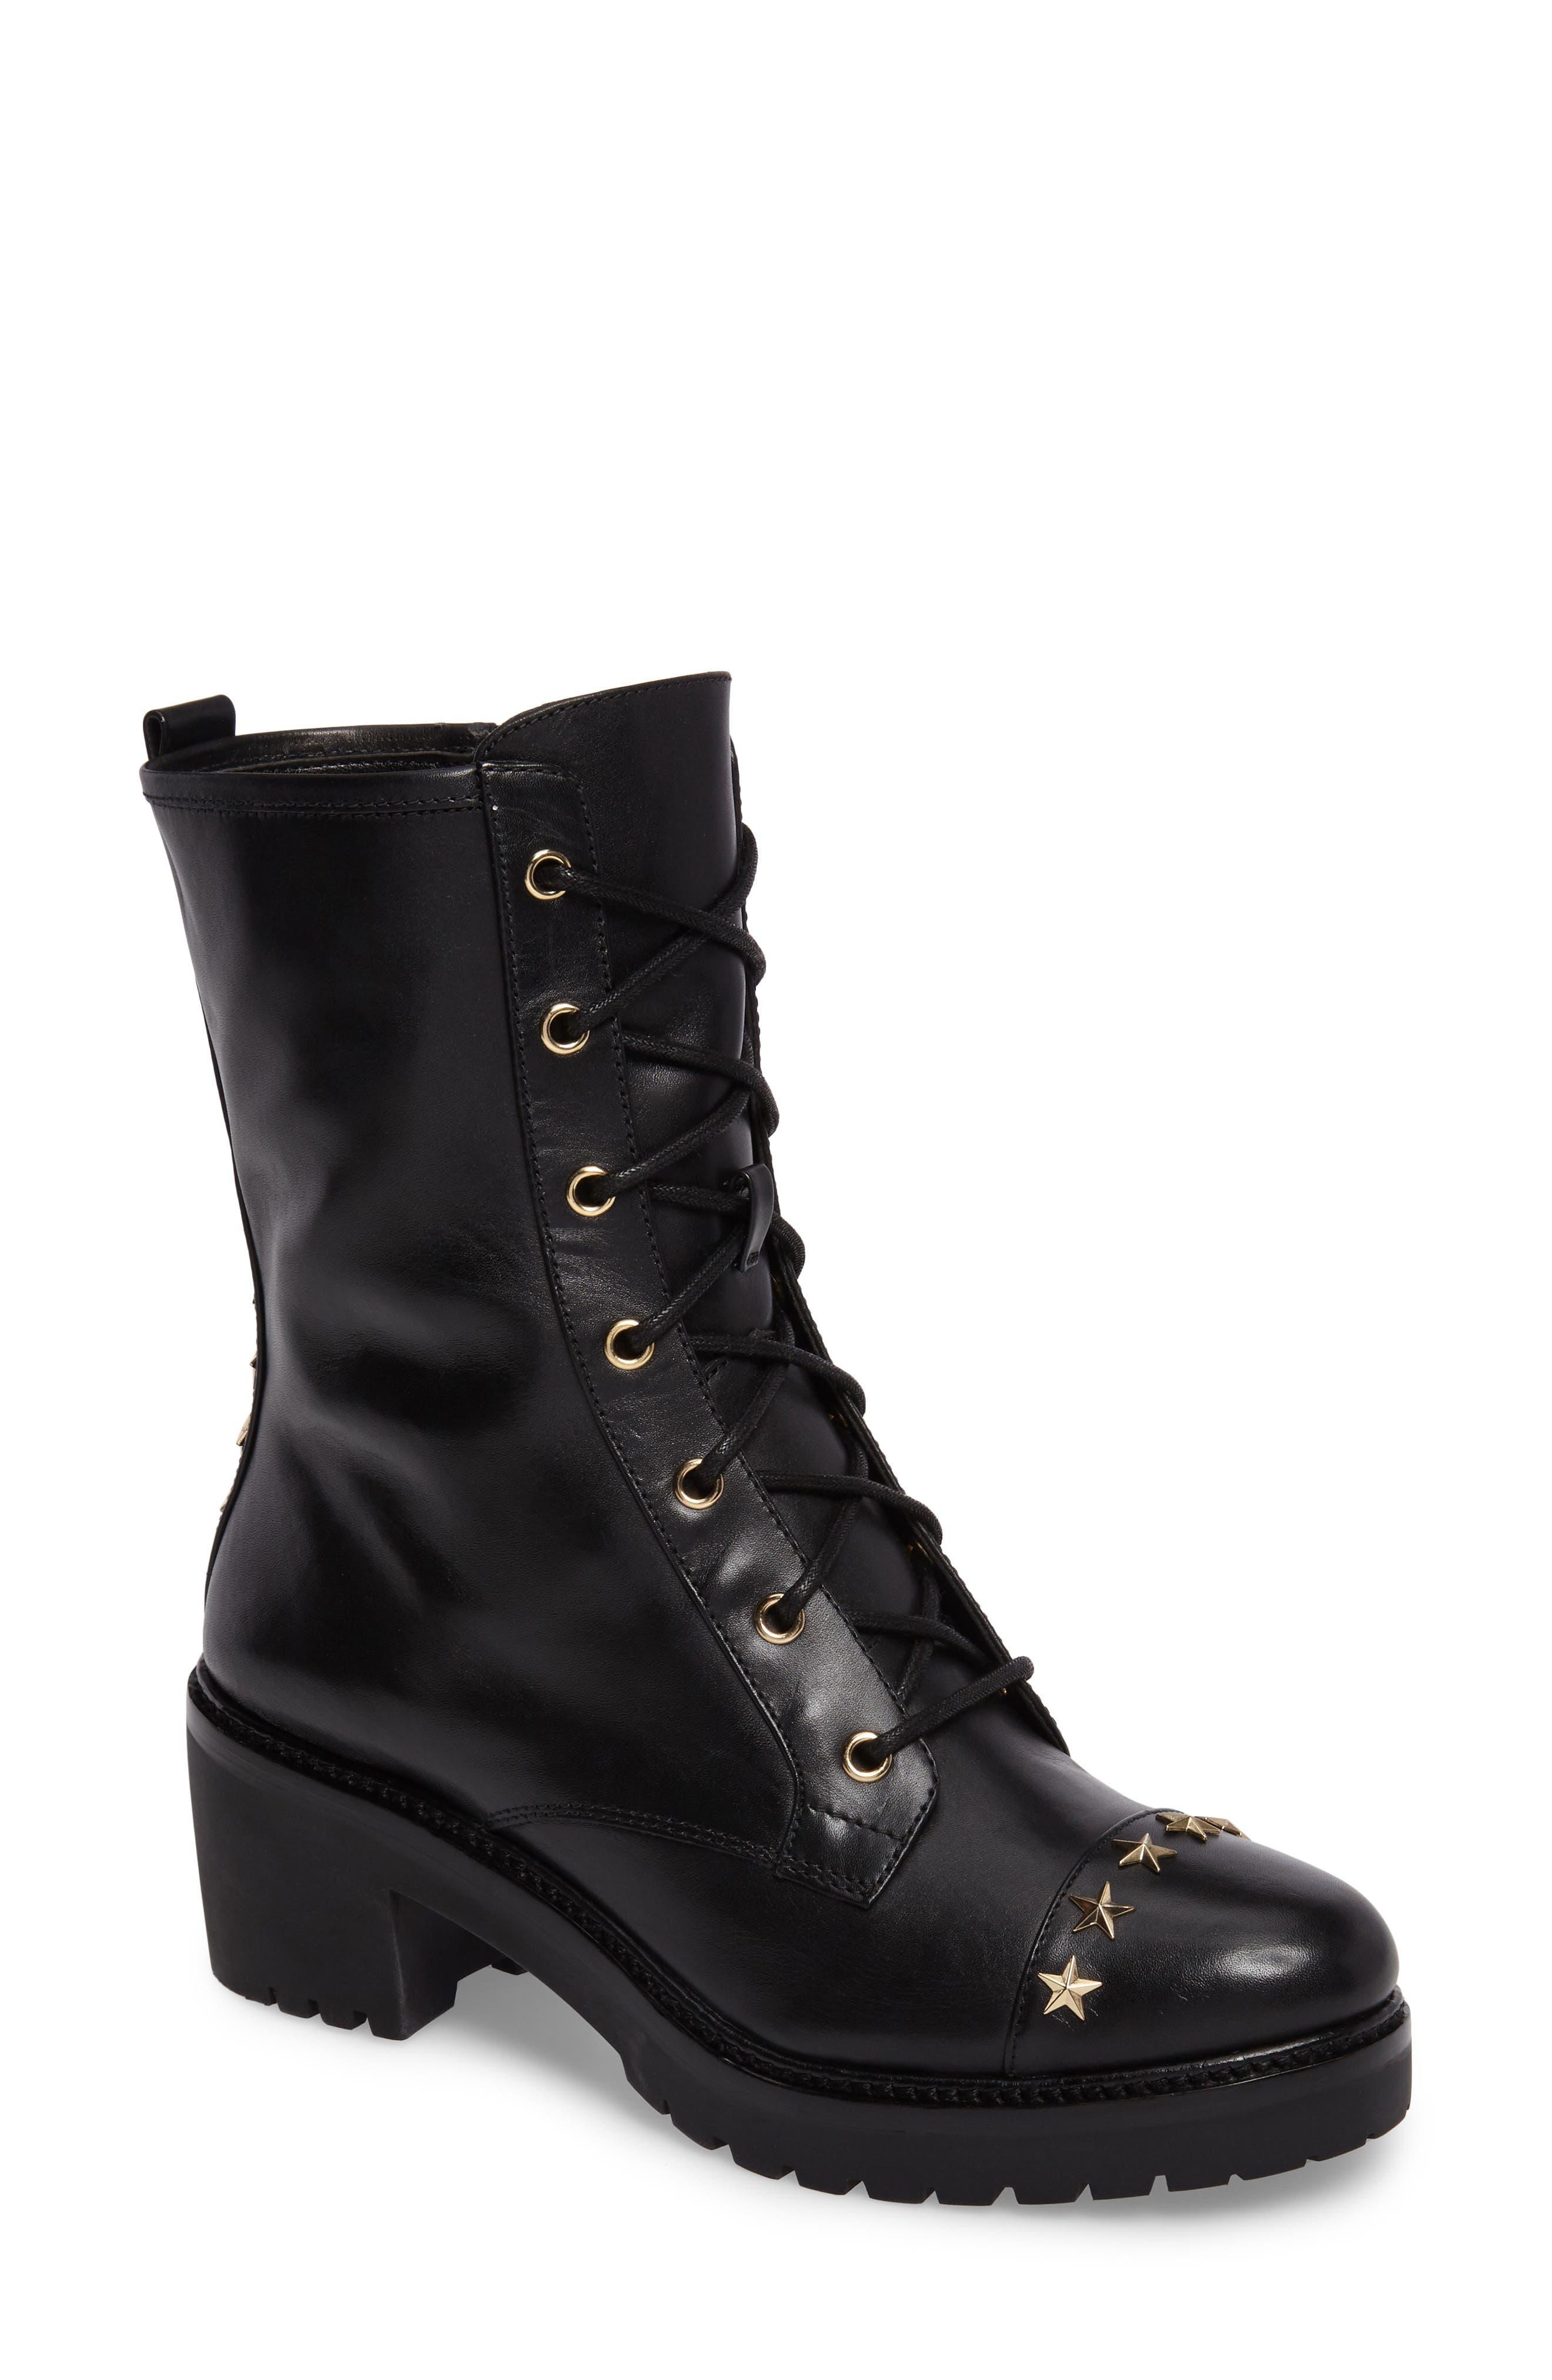 Cody Combat Boot,                         Main,                         color, 001